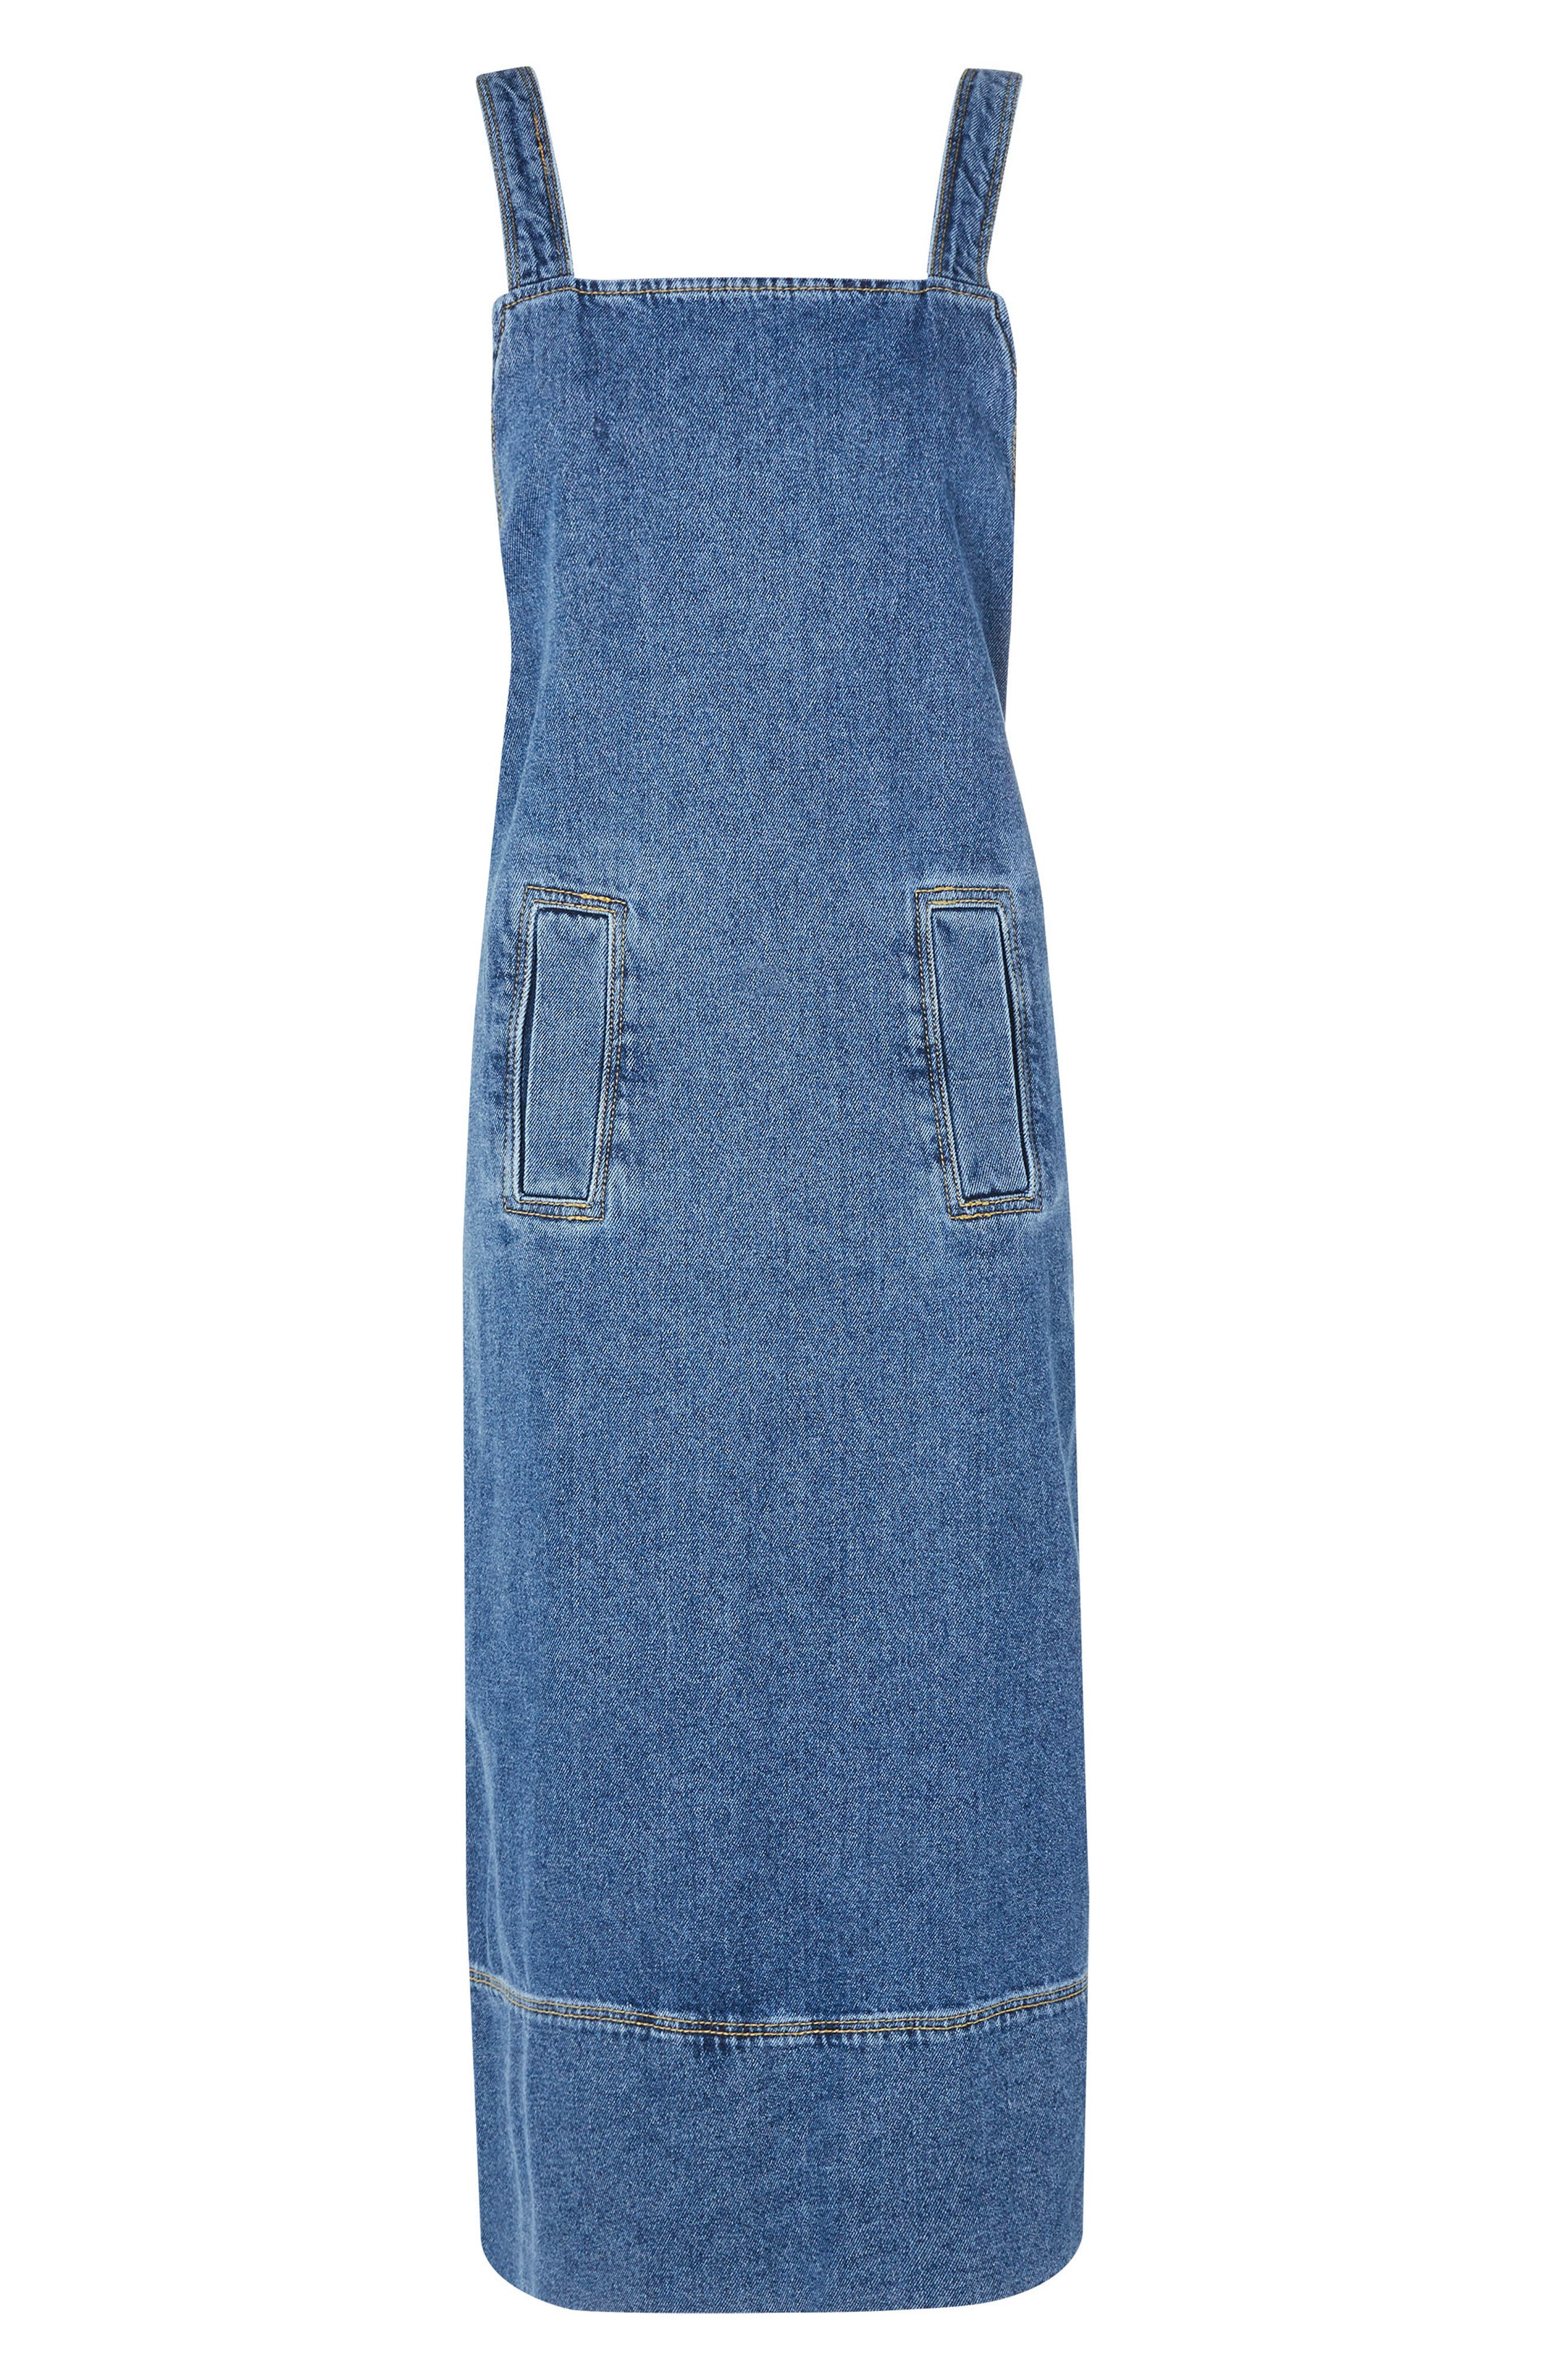 Denim Pinafore Wrap Dress,                             Main thumbnail 1, color,                             Blue